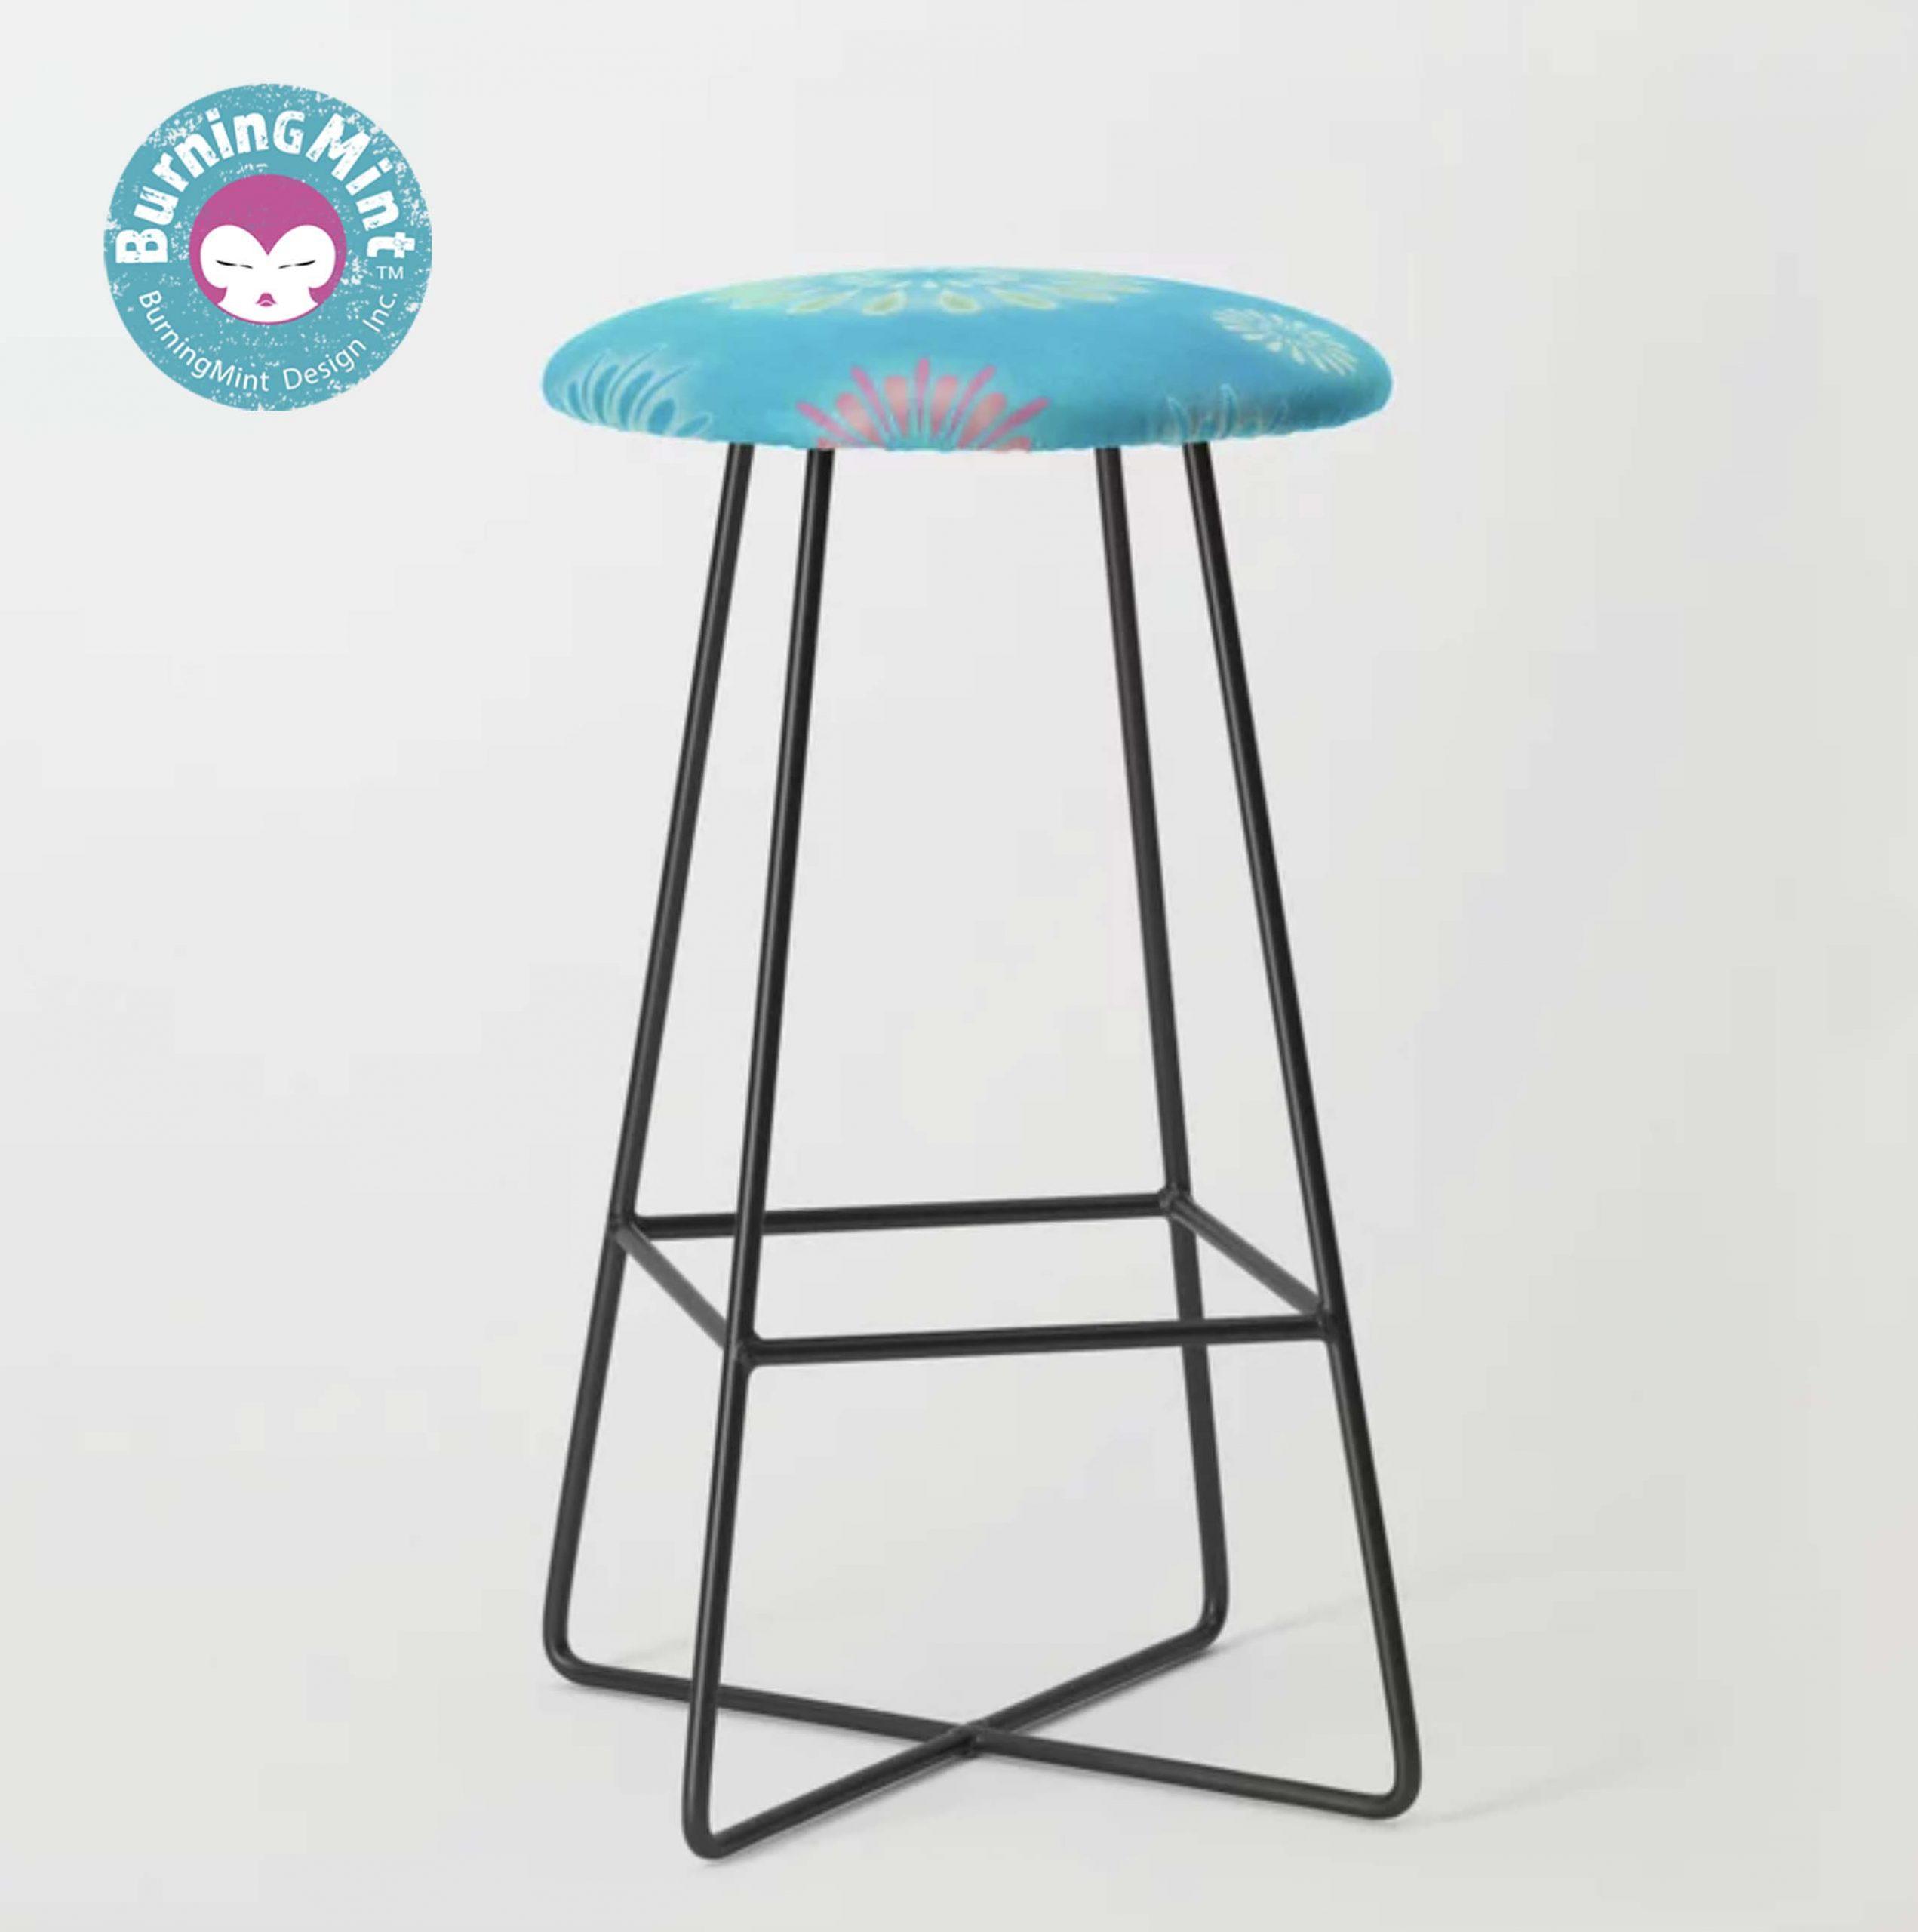 Fireworks stool